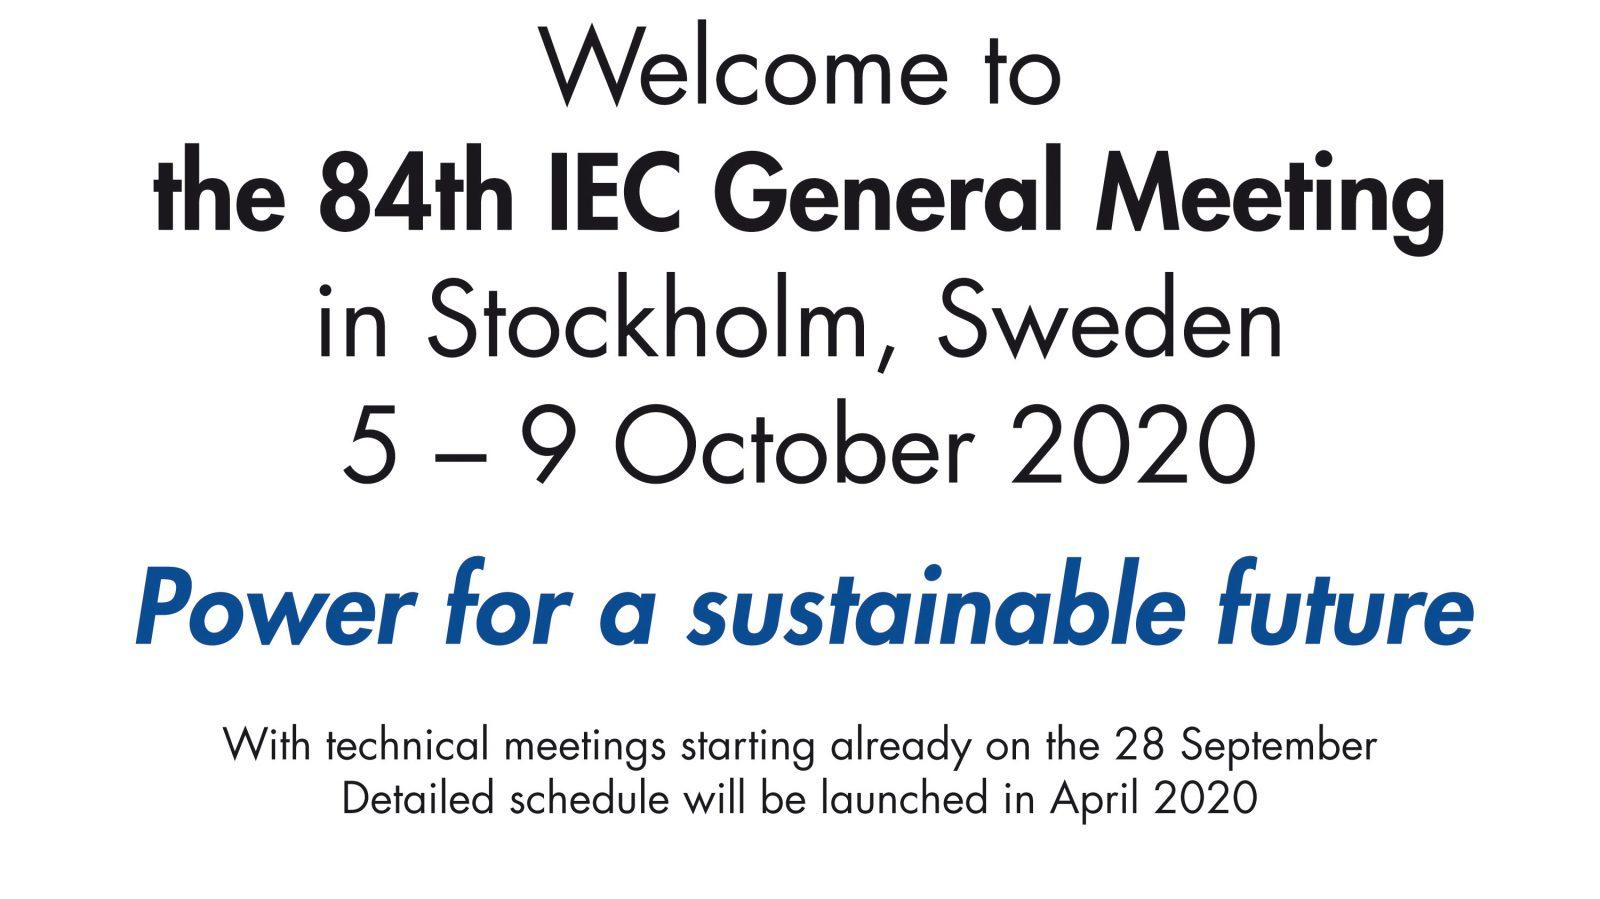 Welcome_IEC_General_Meeting_2020_Stockholm_Sweden